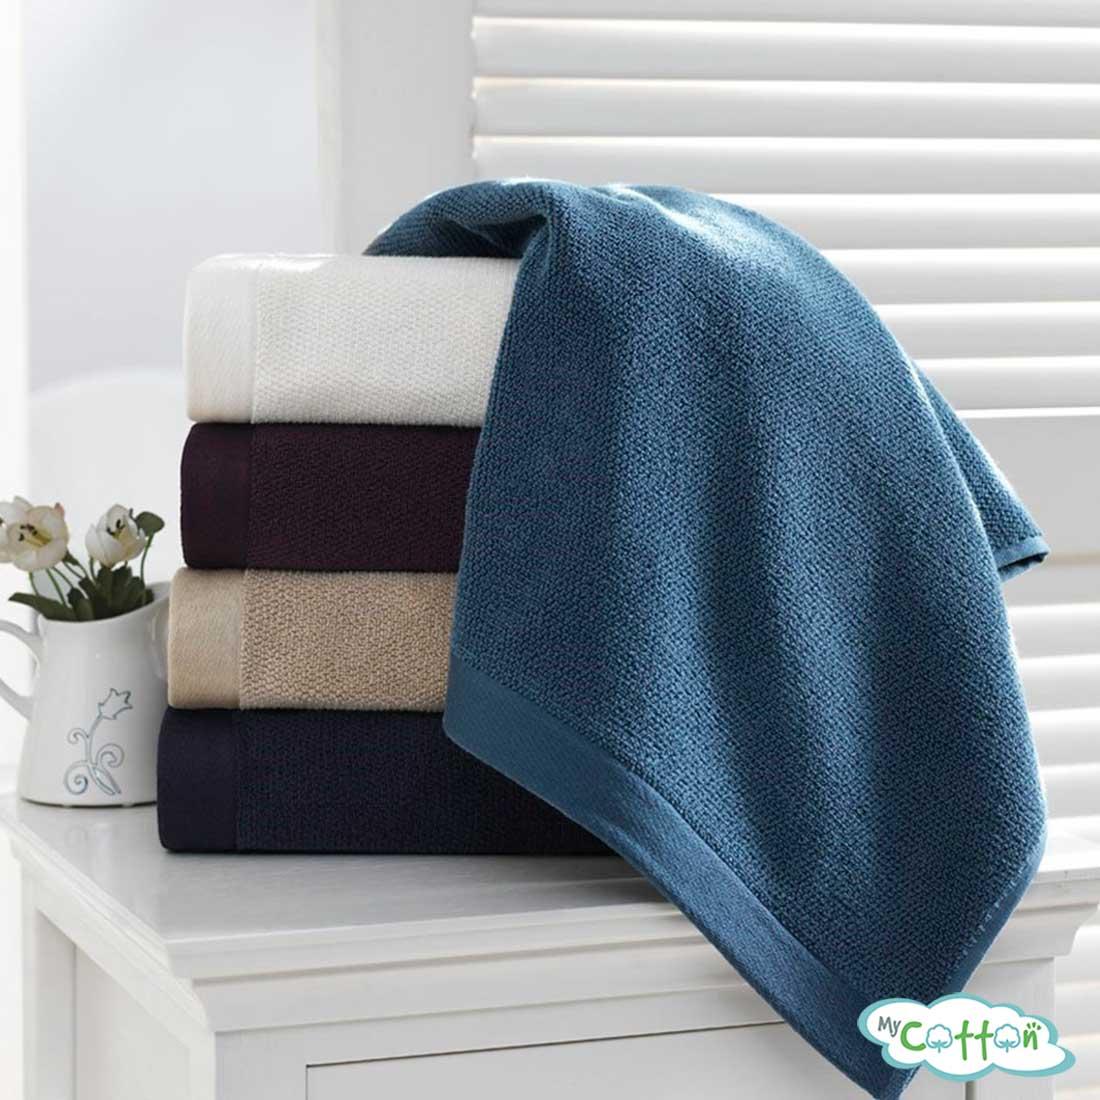 Полотенце махровое Soft Cotton кремовое LORD